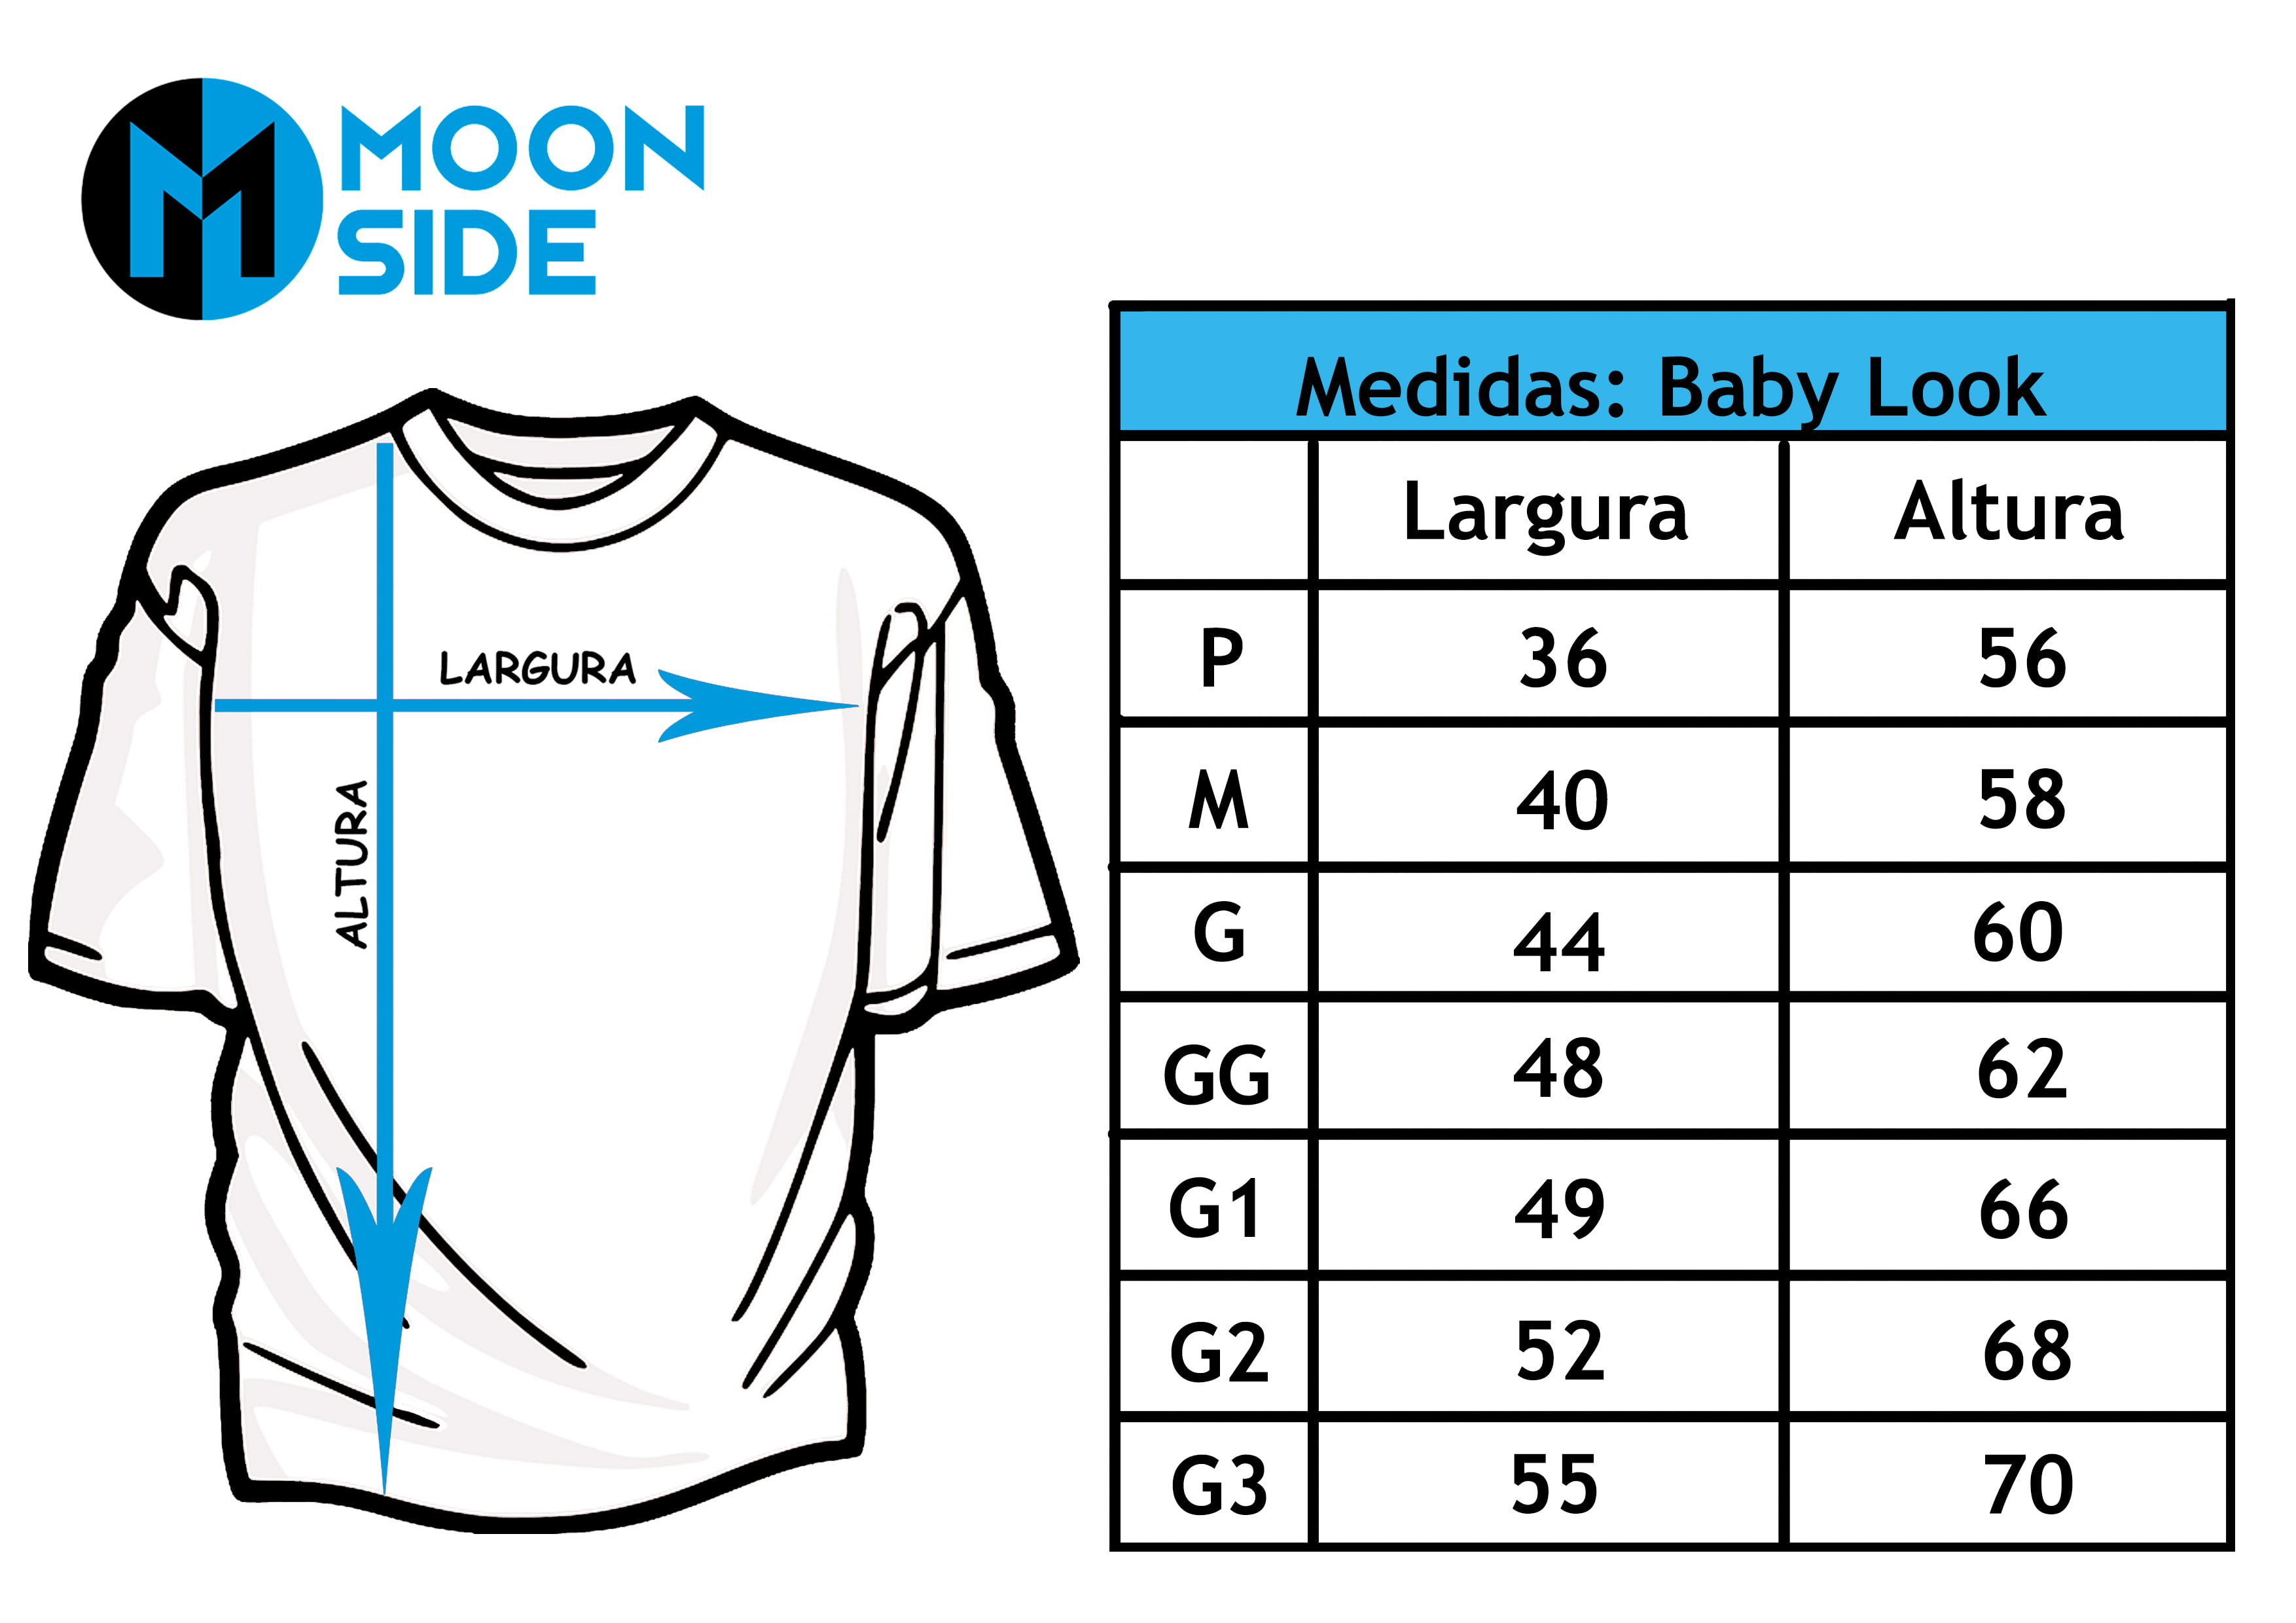 Tabela de Tamanhos Adulto Tradicional  Moon Side Store.